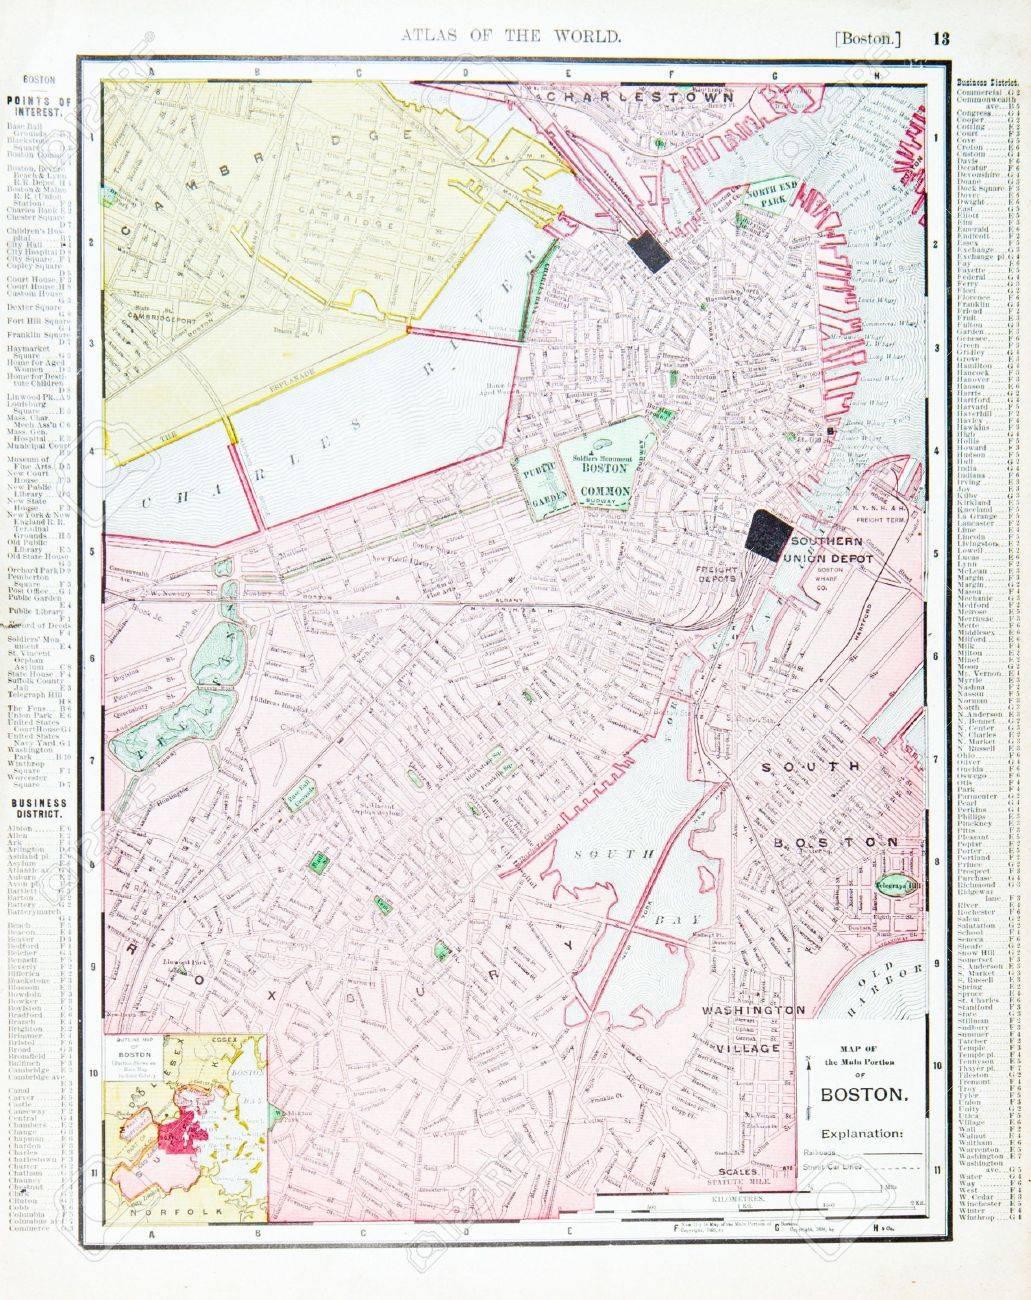 Map Usa States Boston Maps Of USA FileMap Of The USA Highlighting - Us map boston